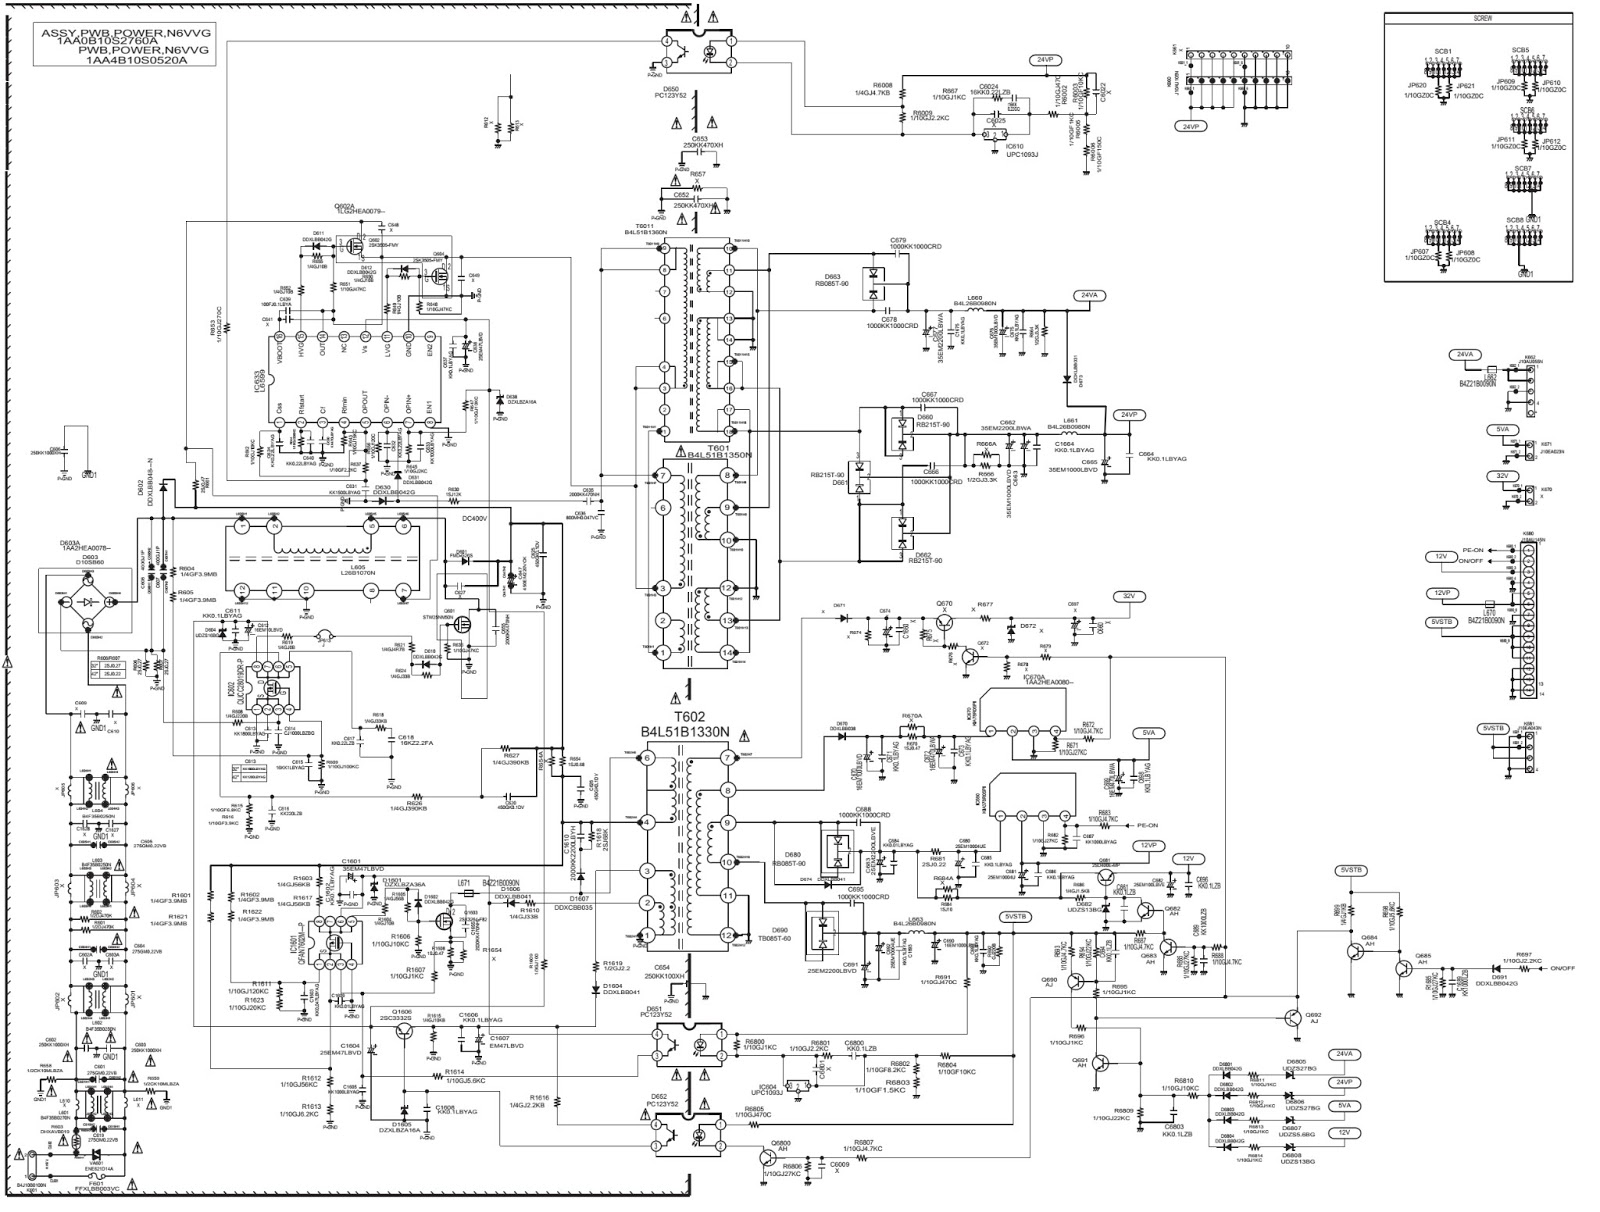 sanyo schematic diagram sanyo tv diagram sanyo lcd 32k30 - how to enter service mode - white ... #3